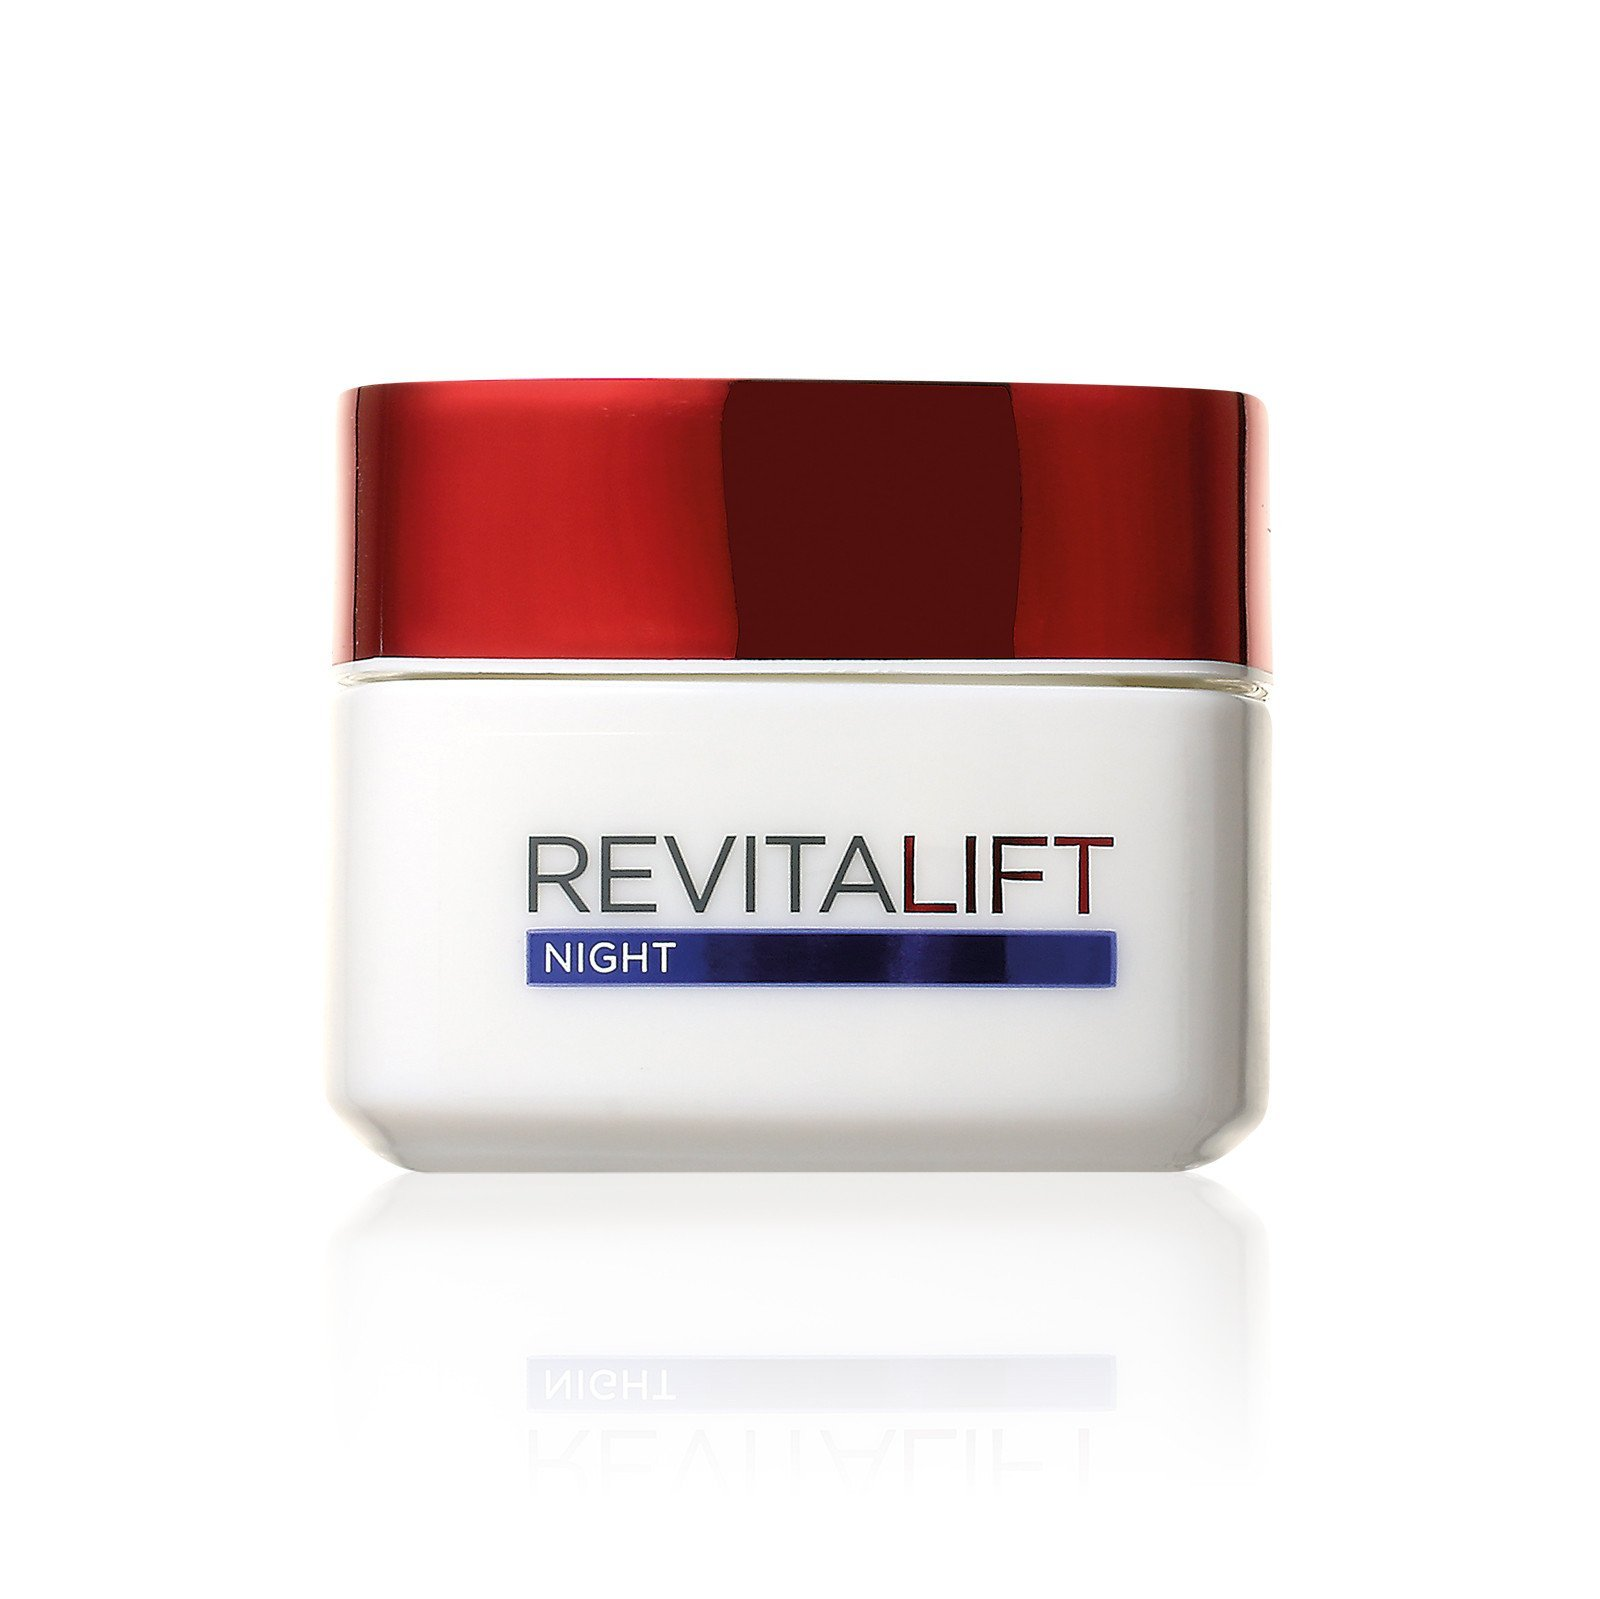 L'Oreal Revitalift Anti-Wrinkle Plus Firming Night Cream 48g - $34.99